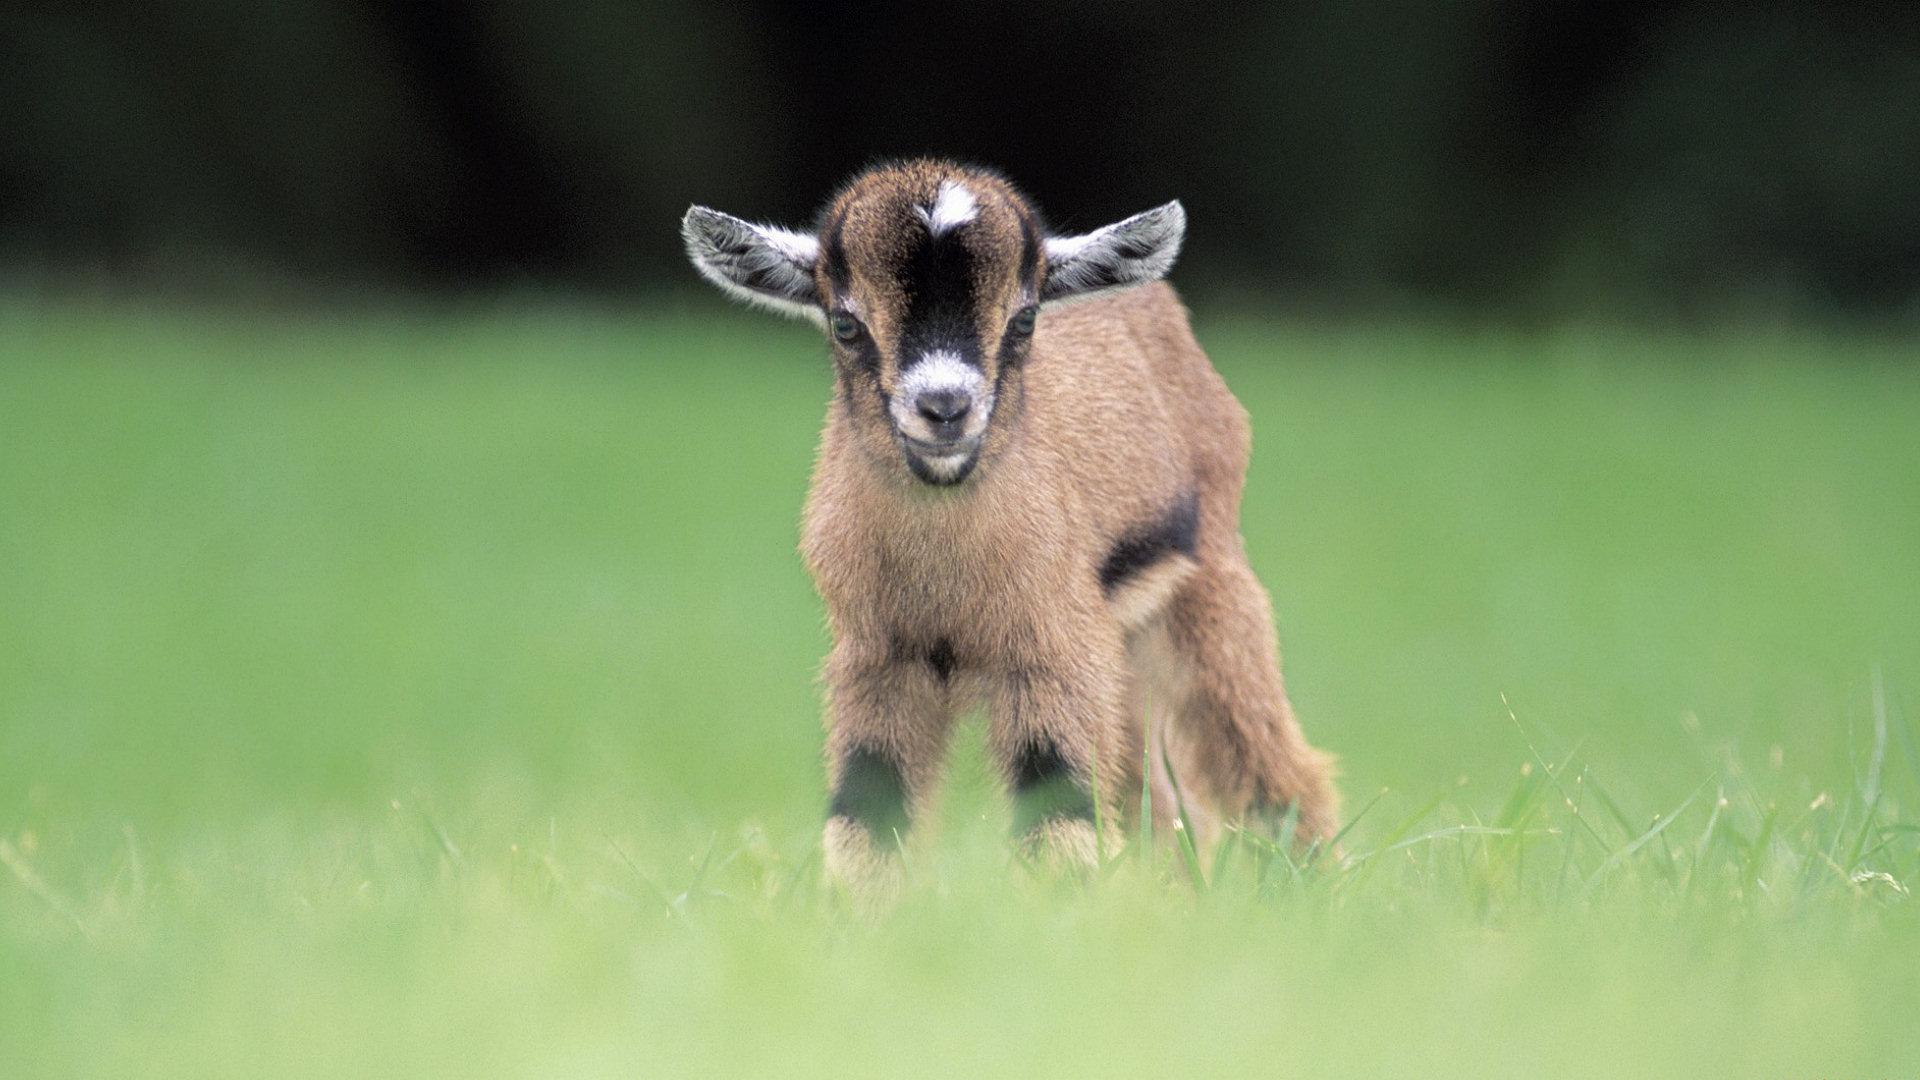 Baby Goat Wallpaper